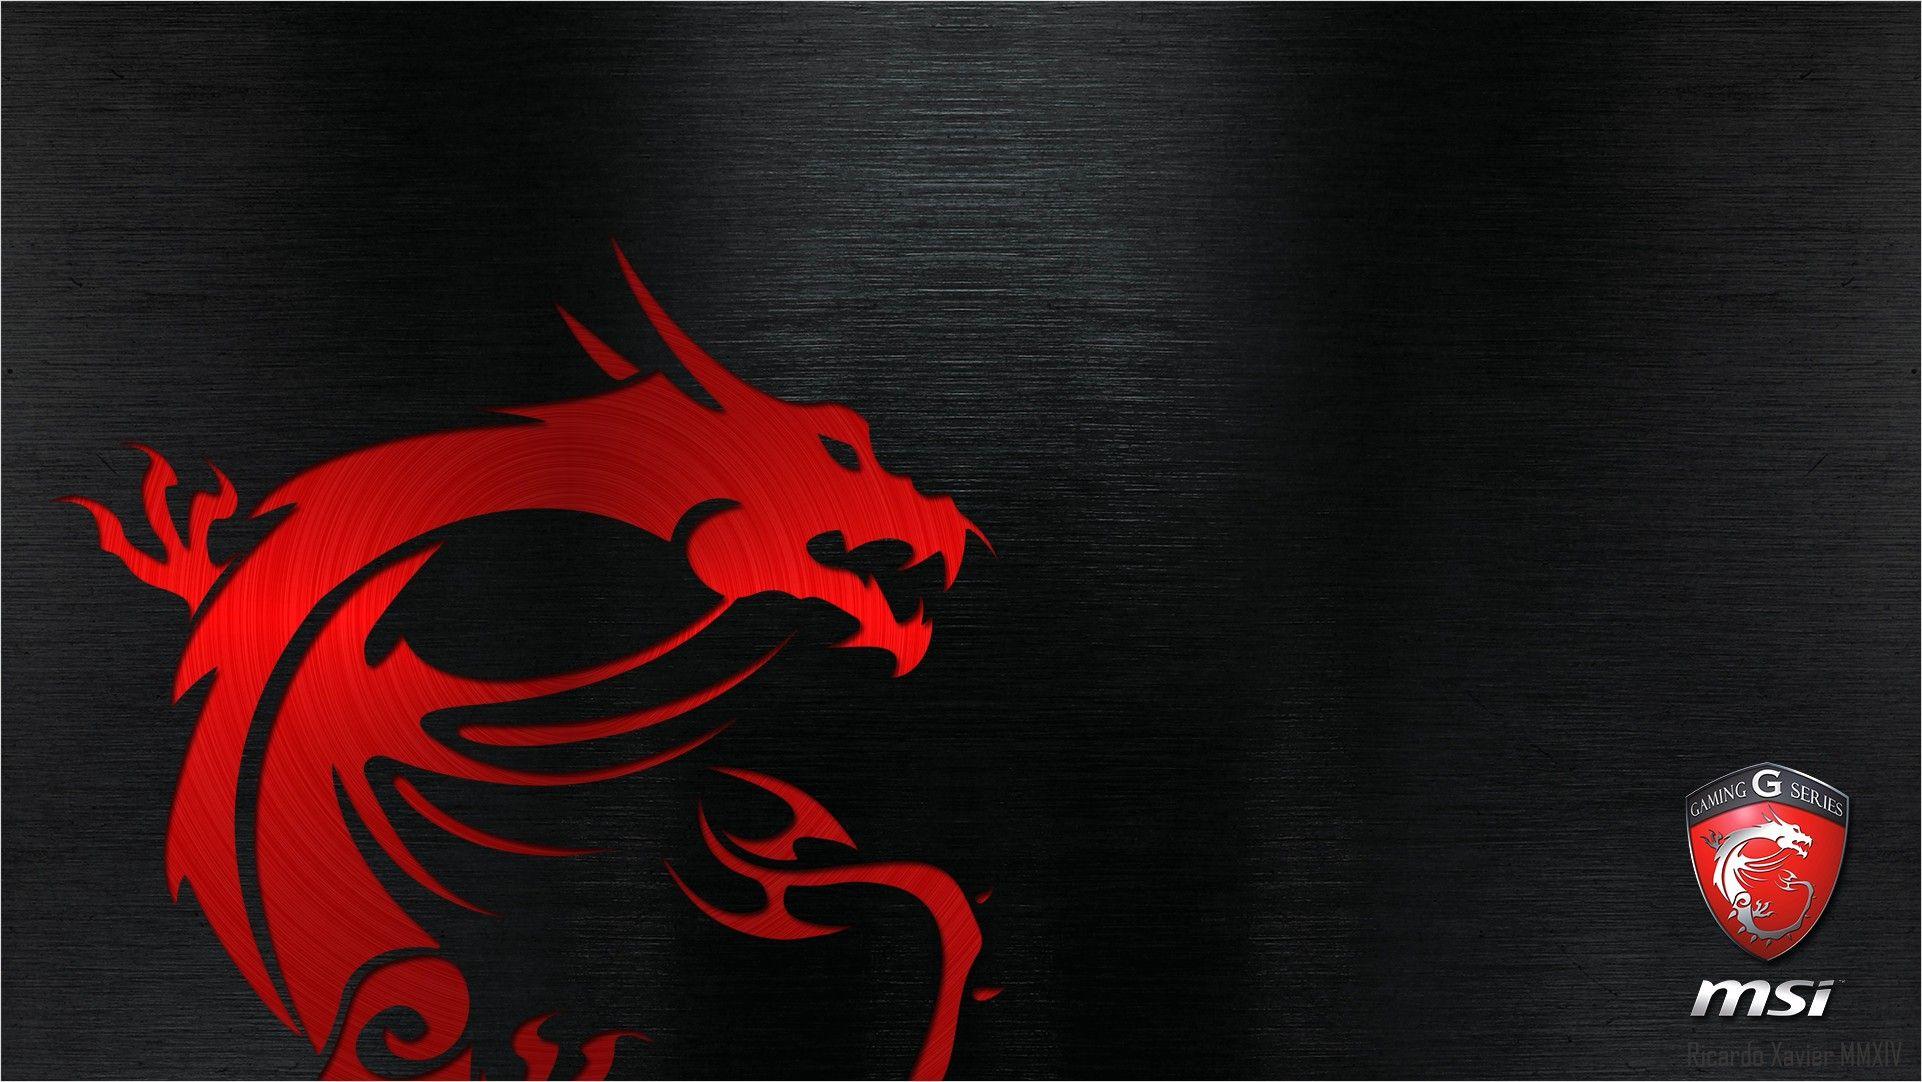 4k Wallpaper For Laptop Dragons In 2020 Gaming Wallpapers Samsung Wallpaper Msi Laptop